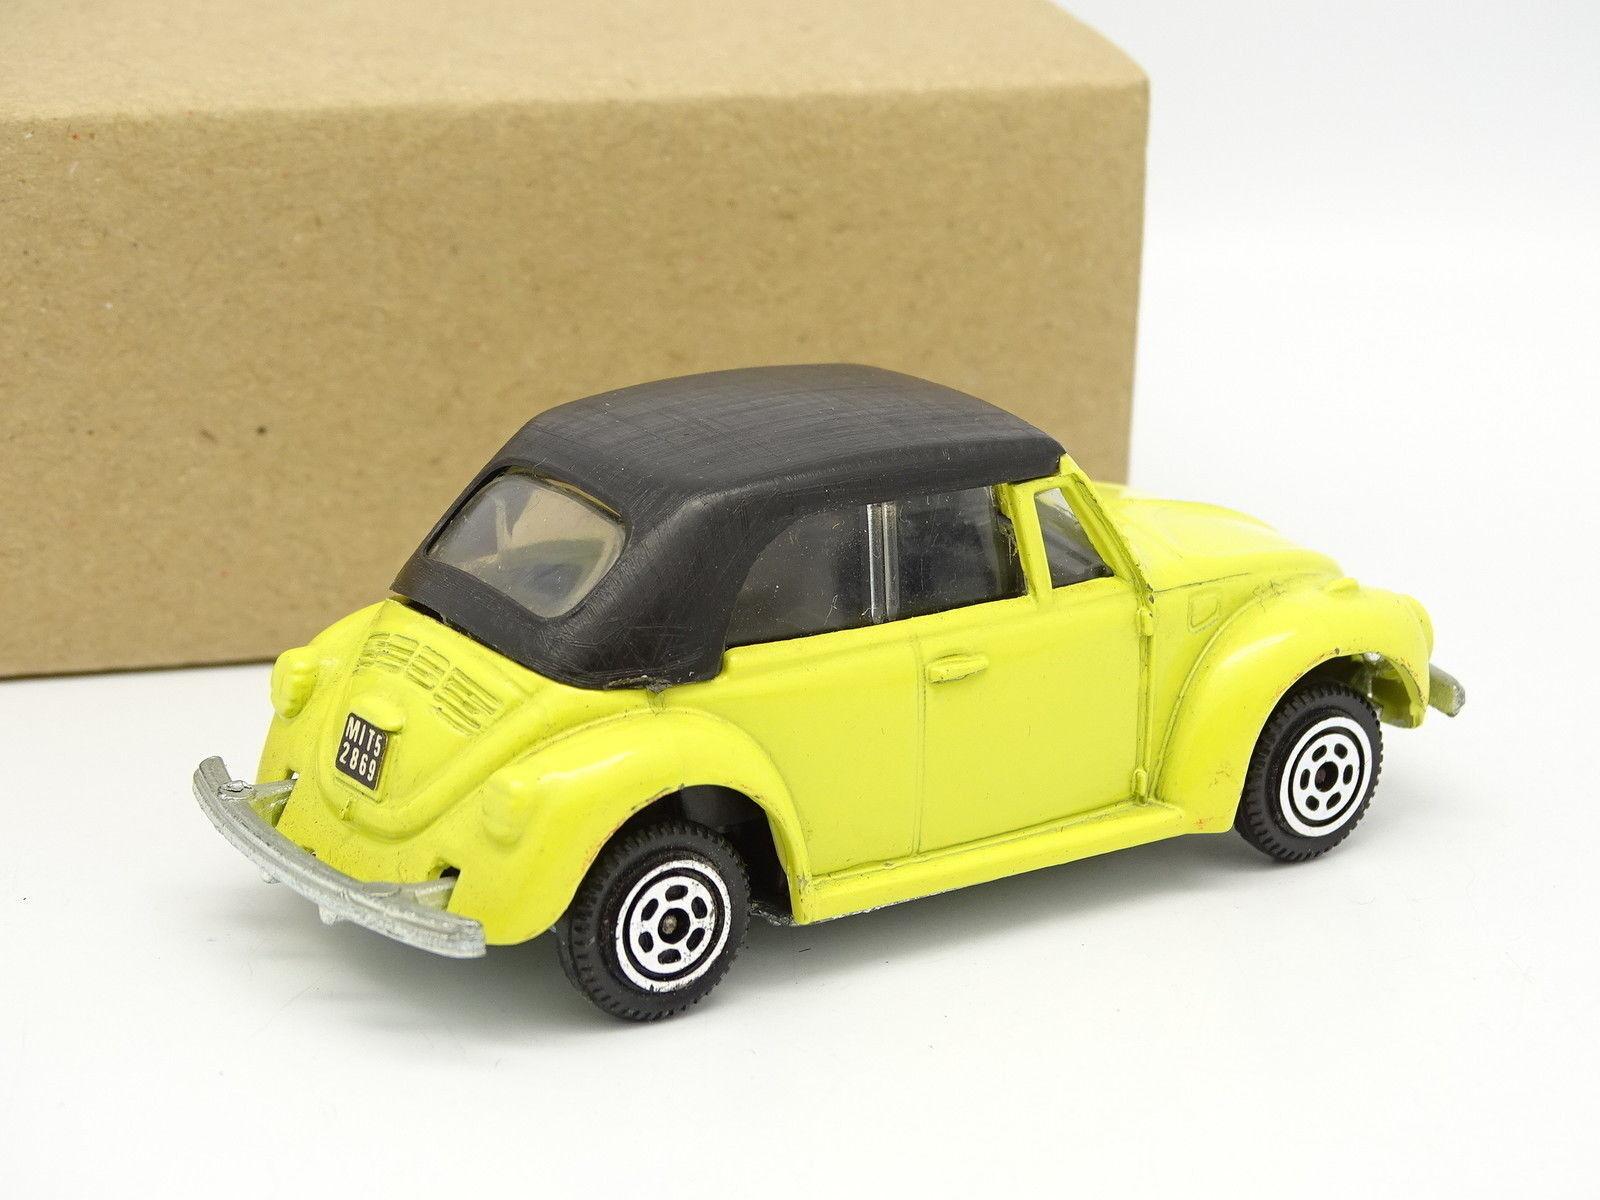 Polistil Sb 1 43 - VW Coccinelle Cabrio Gialla Gialla Gialla 93195e